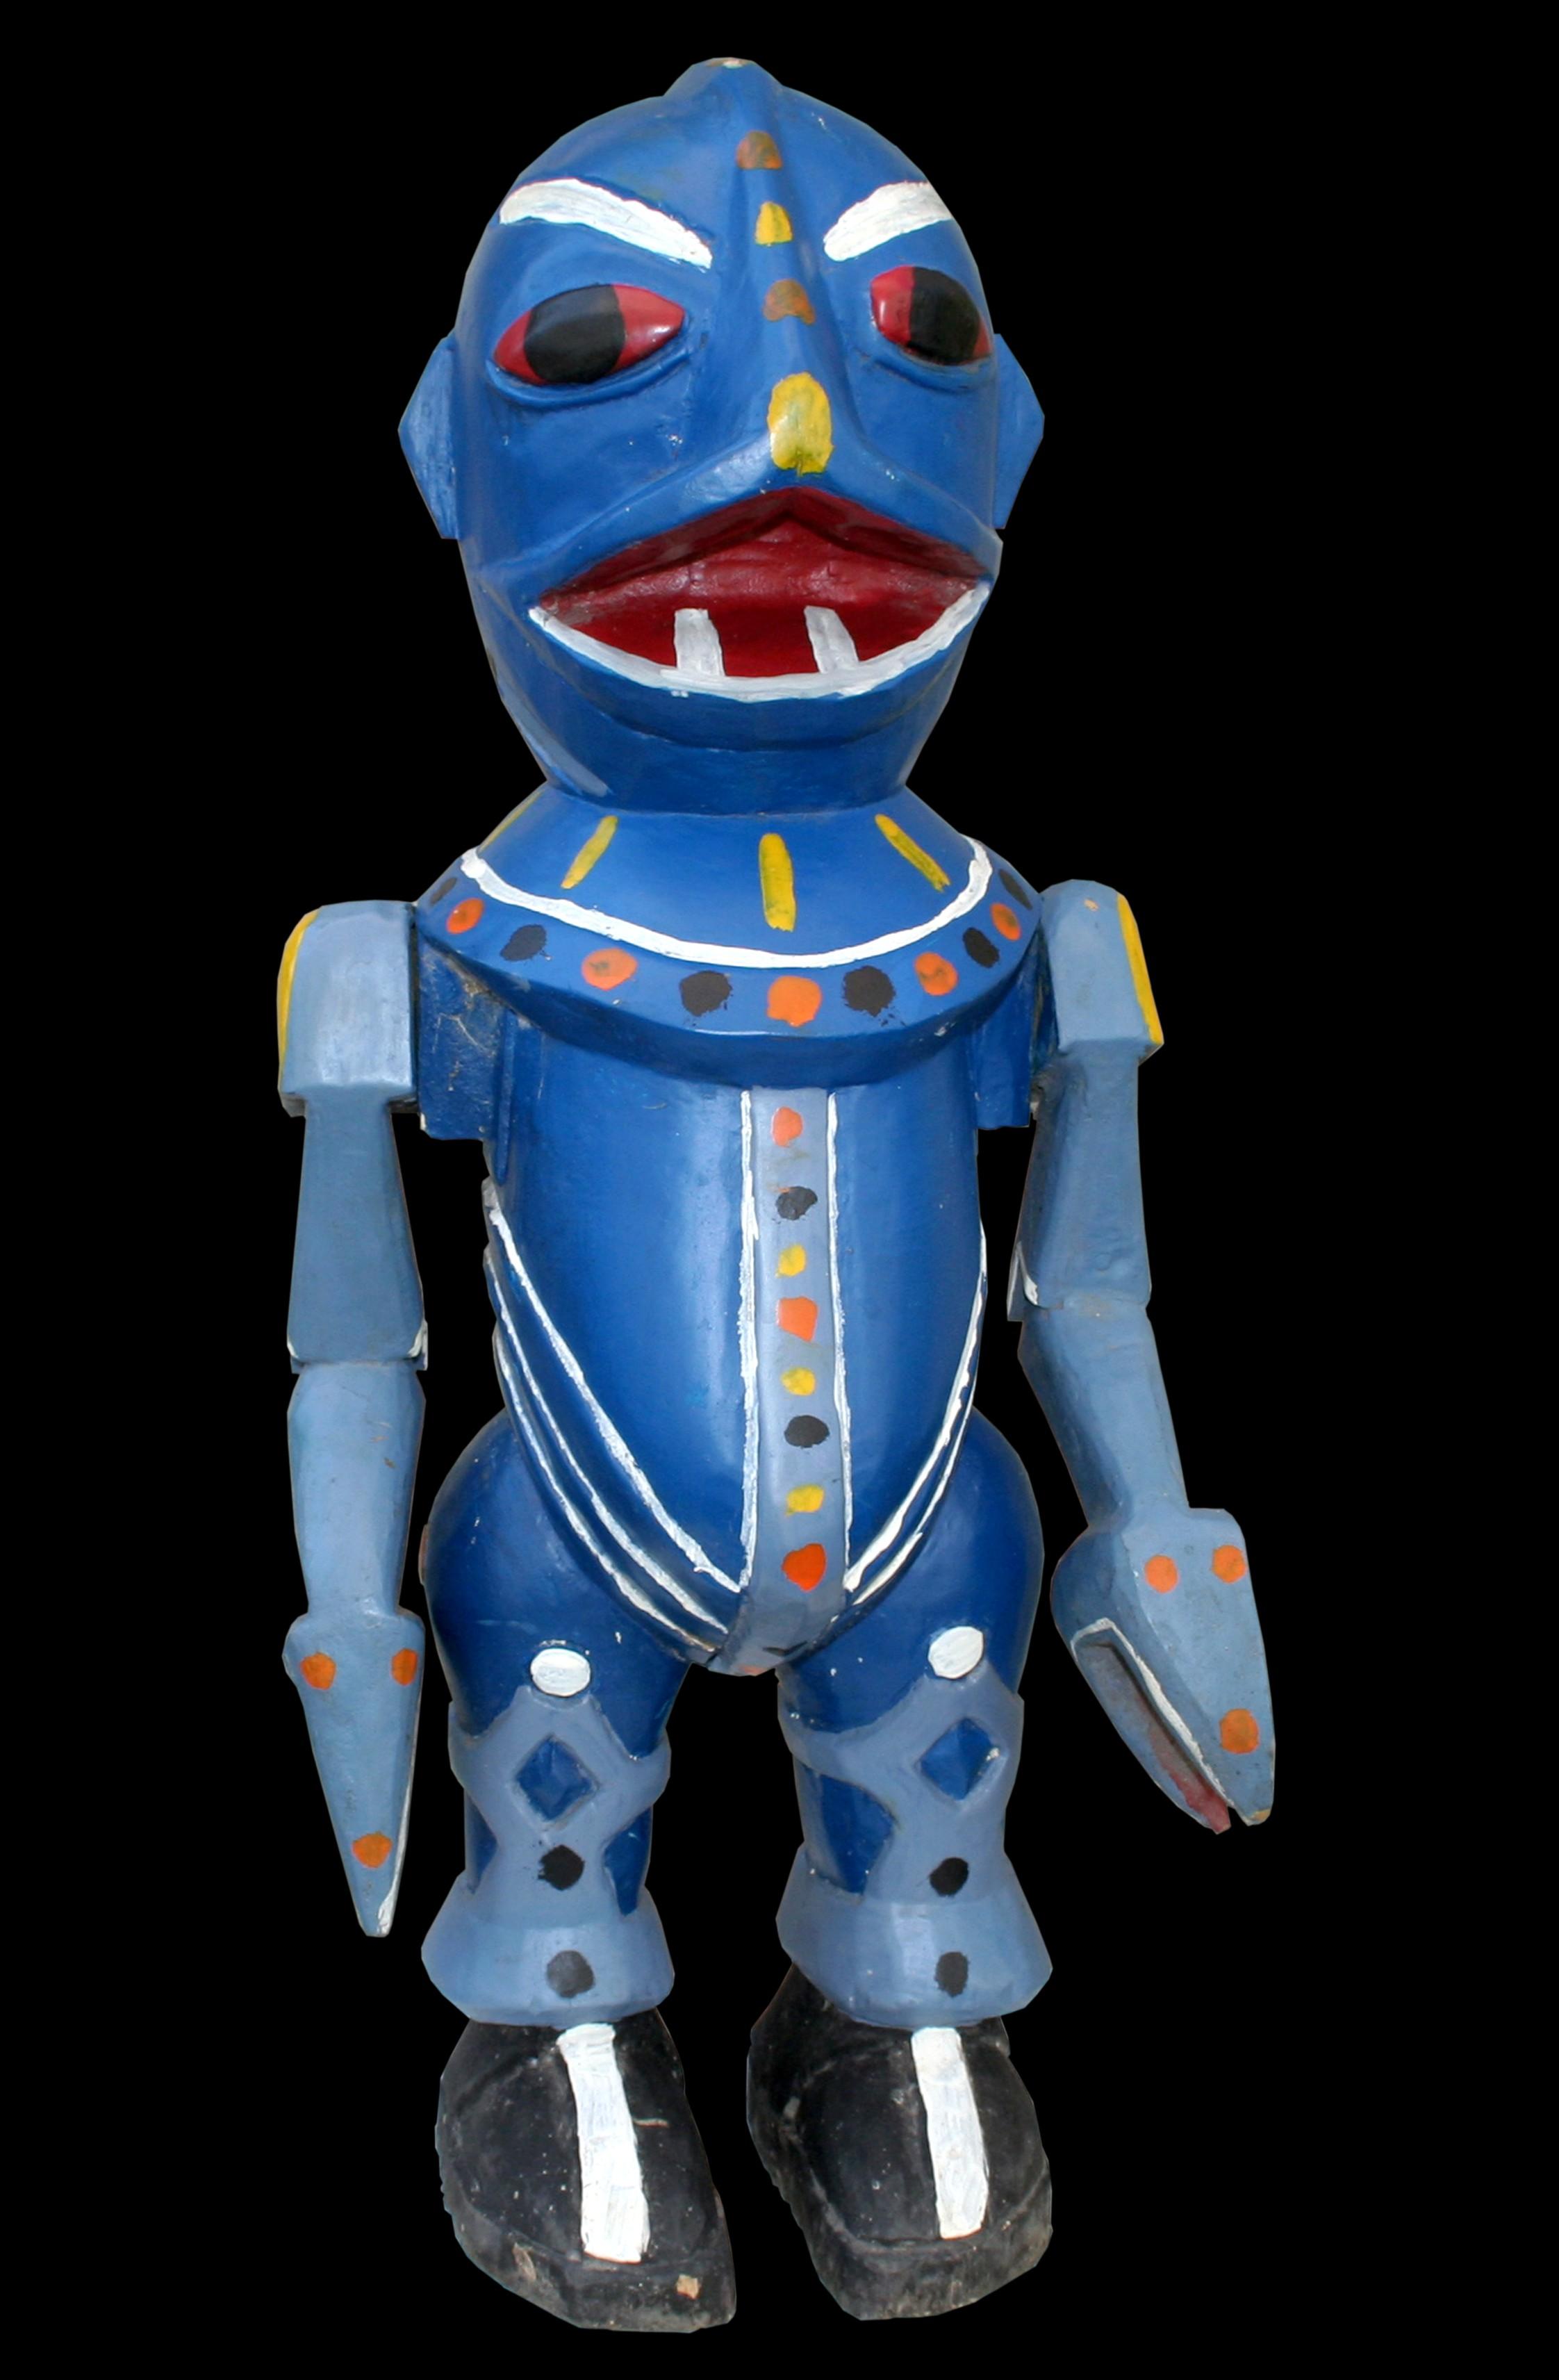 Blue - Sculpture polychrome - Camara Demba - 2008